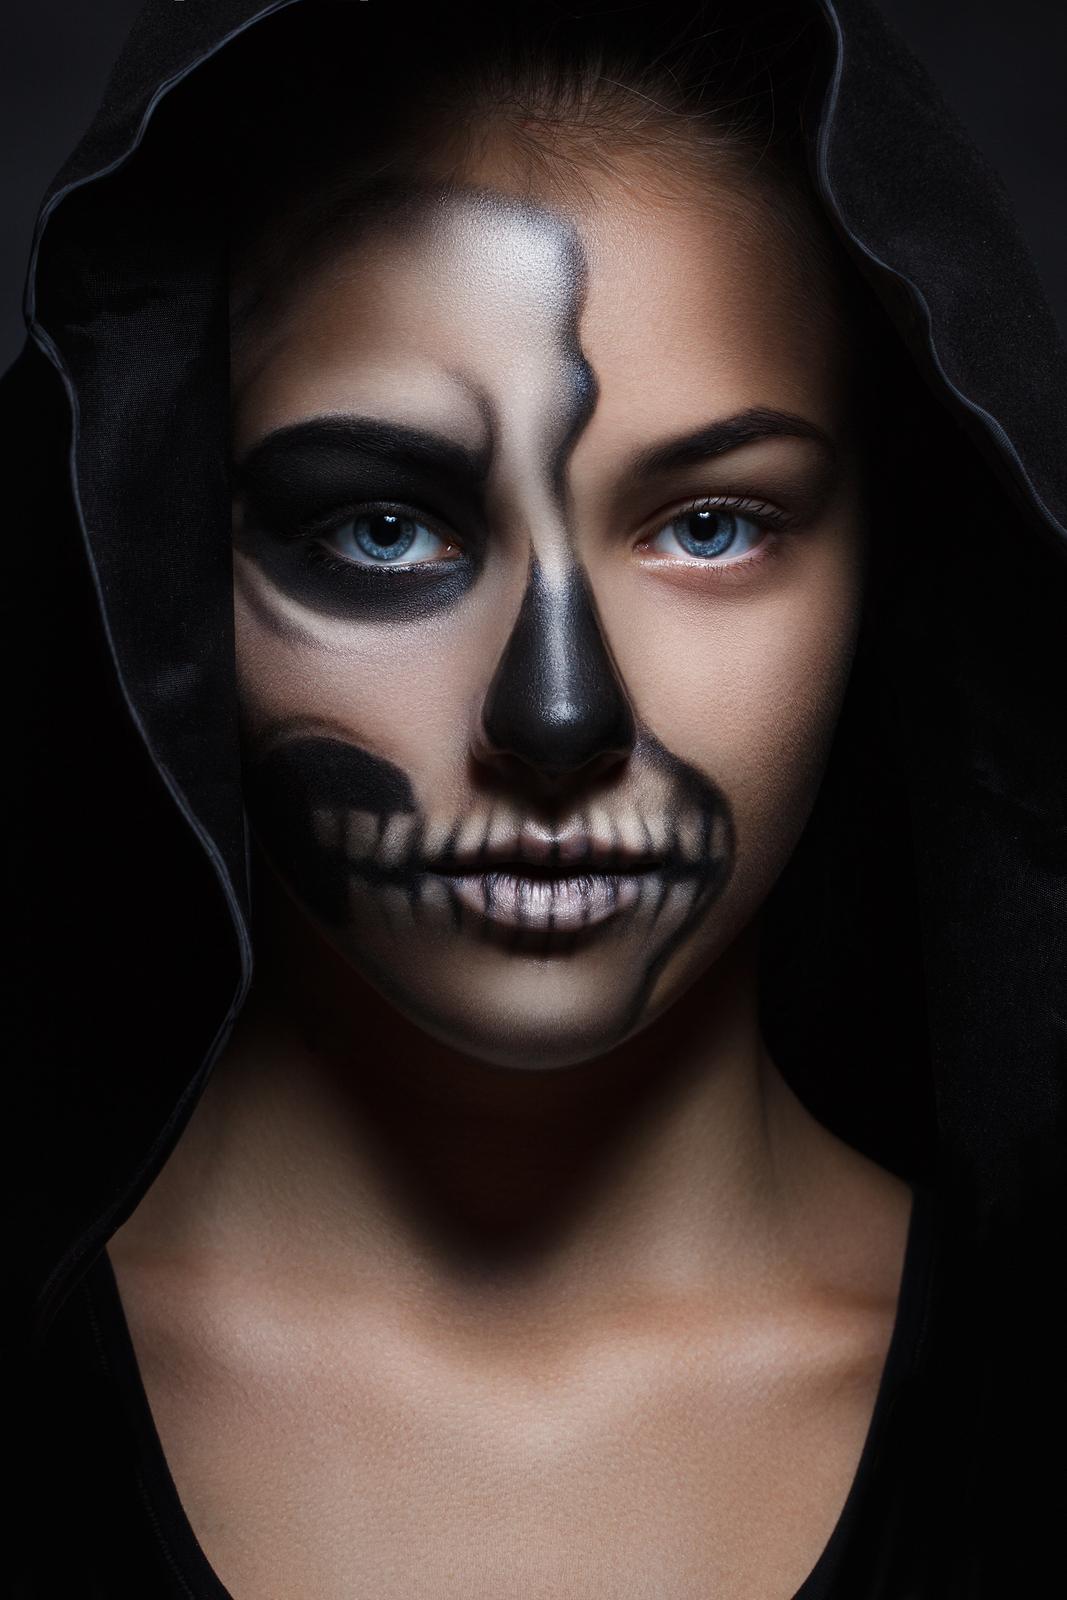 bigstock-Halloween-Portrait-Of-Young-Be-208226317.jpg